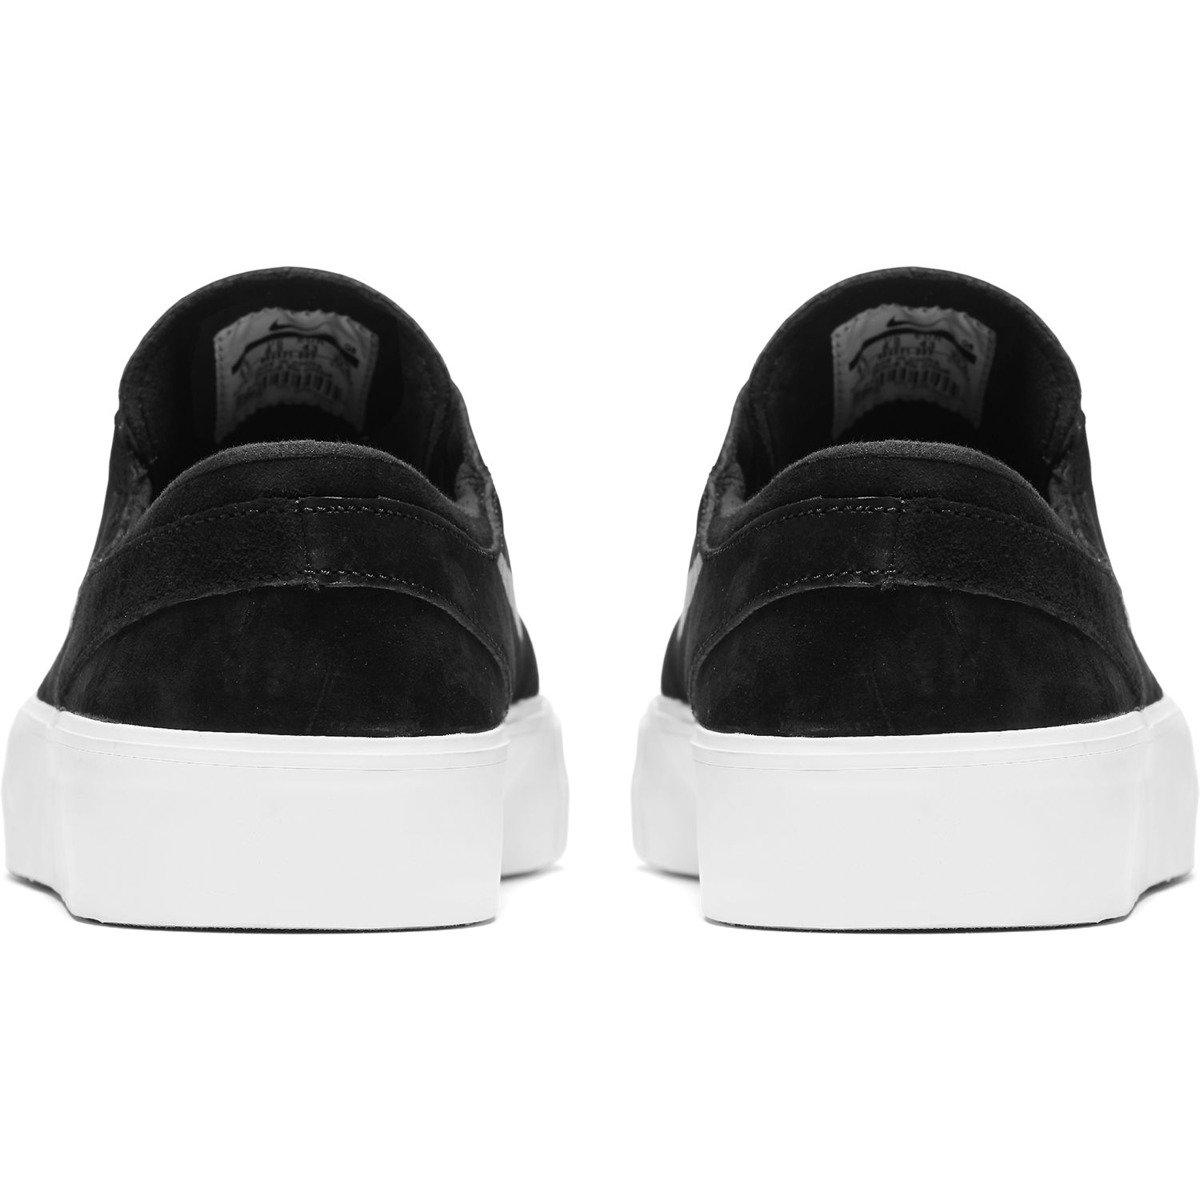 a2c8d49863ed Miniramp Skateshop buty nike sb zoom stefan janoski ht black dark ...